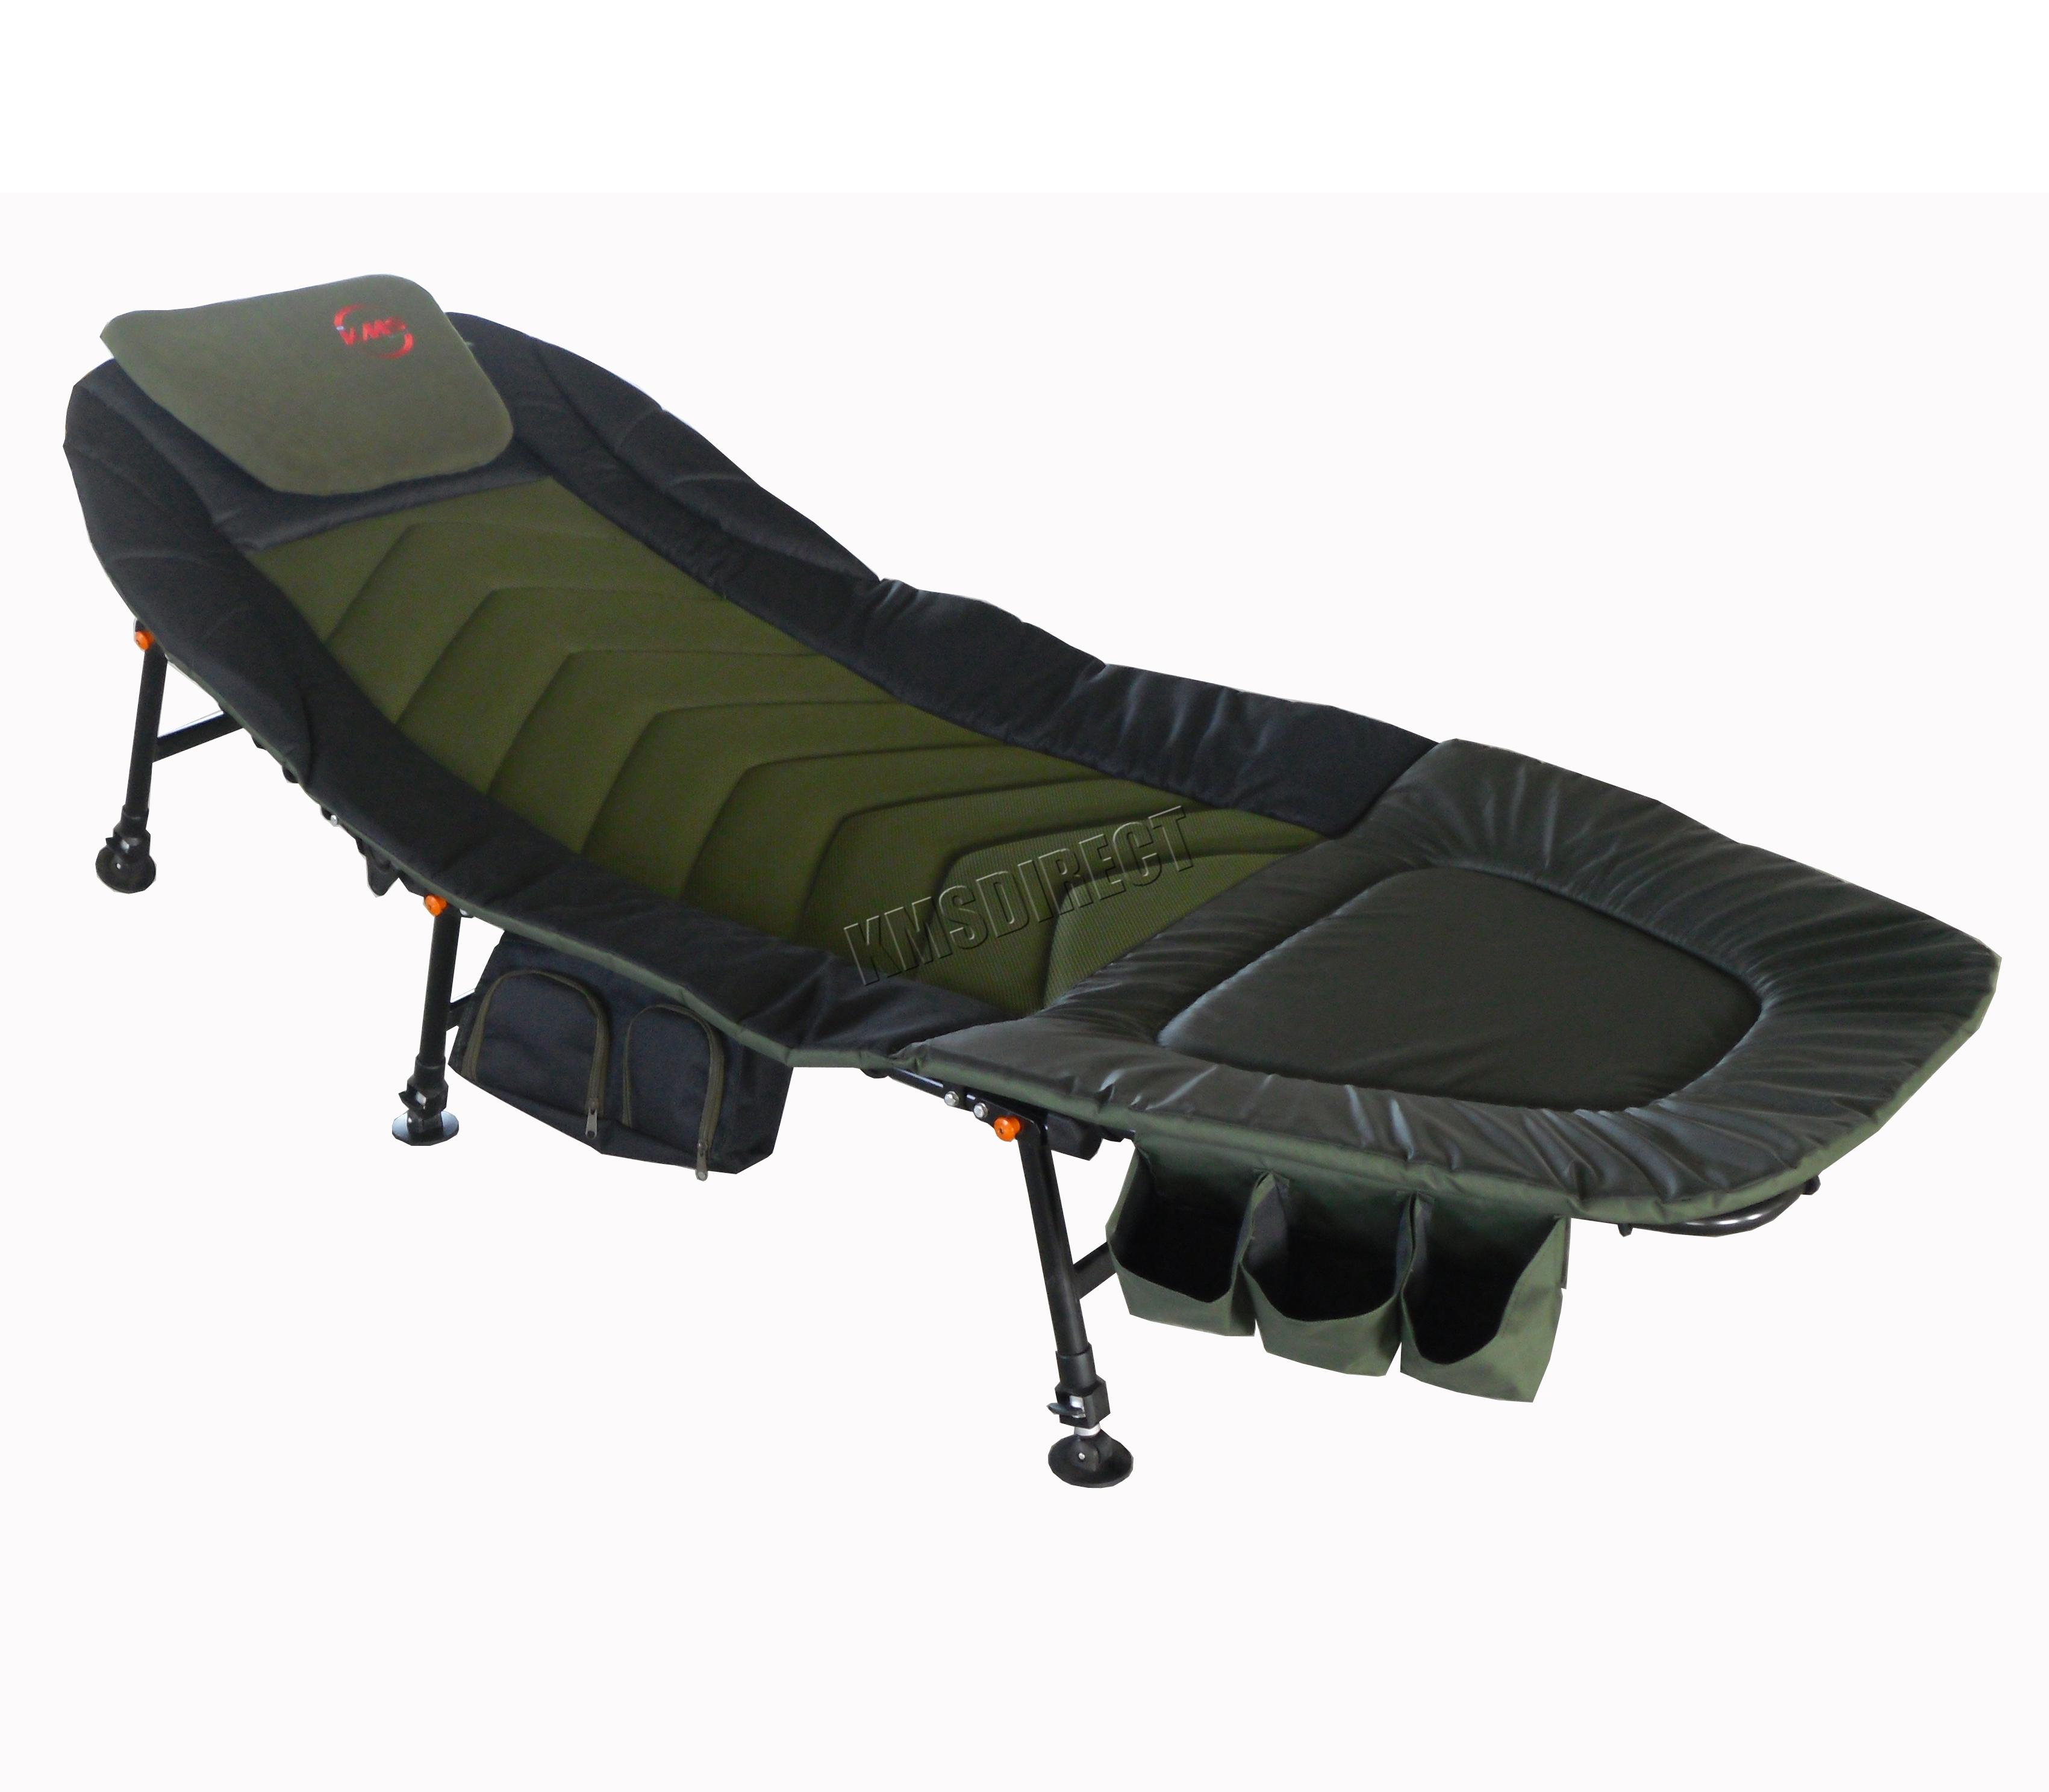 Adjustable Beds Reviews >> Fishing Camping Bed Chair Bedchair 6 Adjustable Legs Tool Bag Pillow Dark Green | eBay